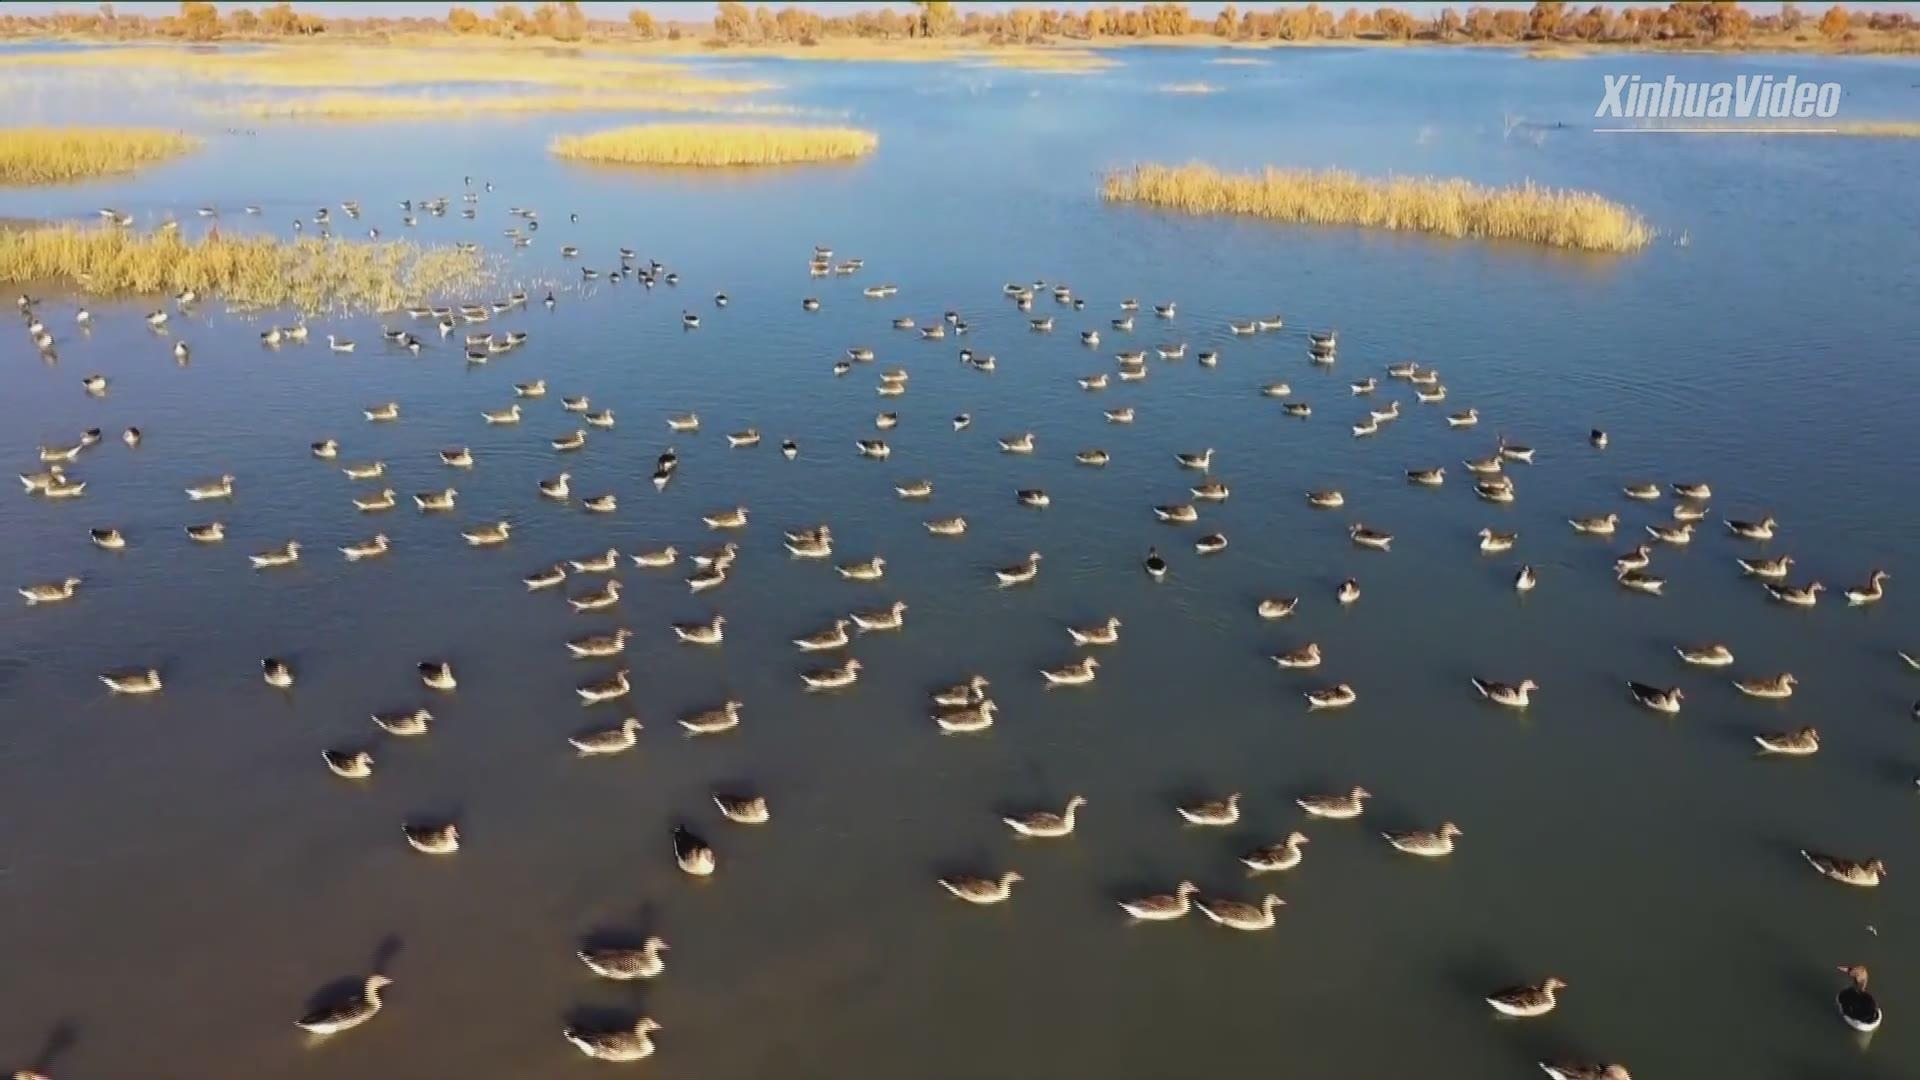 Breathtaking winter sunset in Xinjiang wetland park